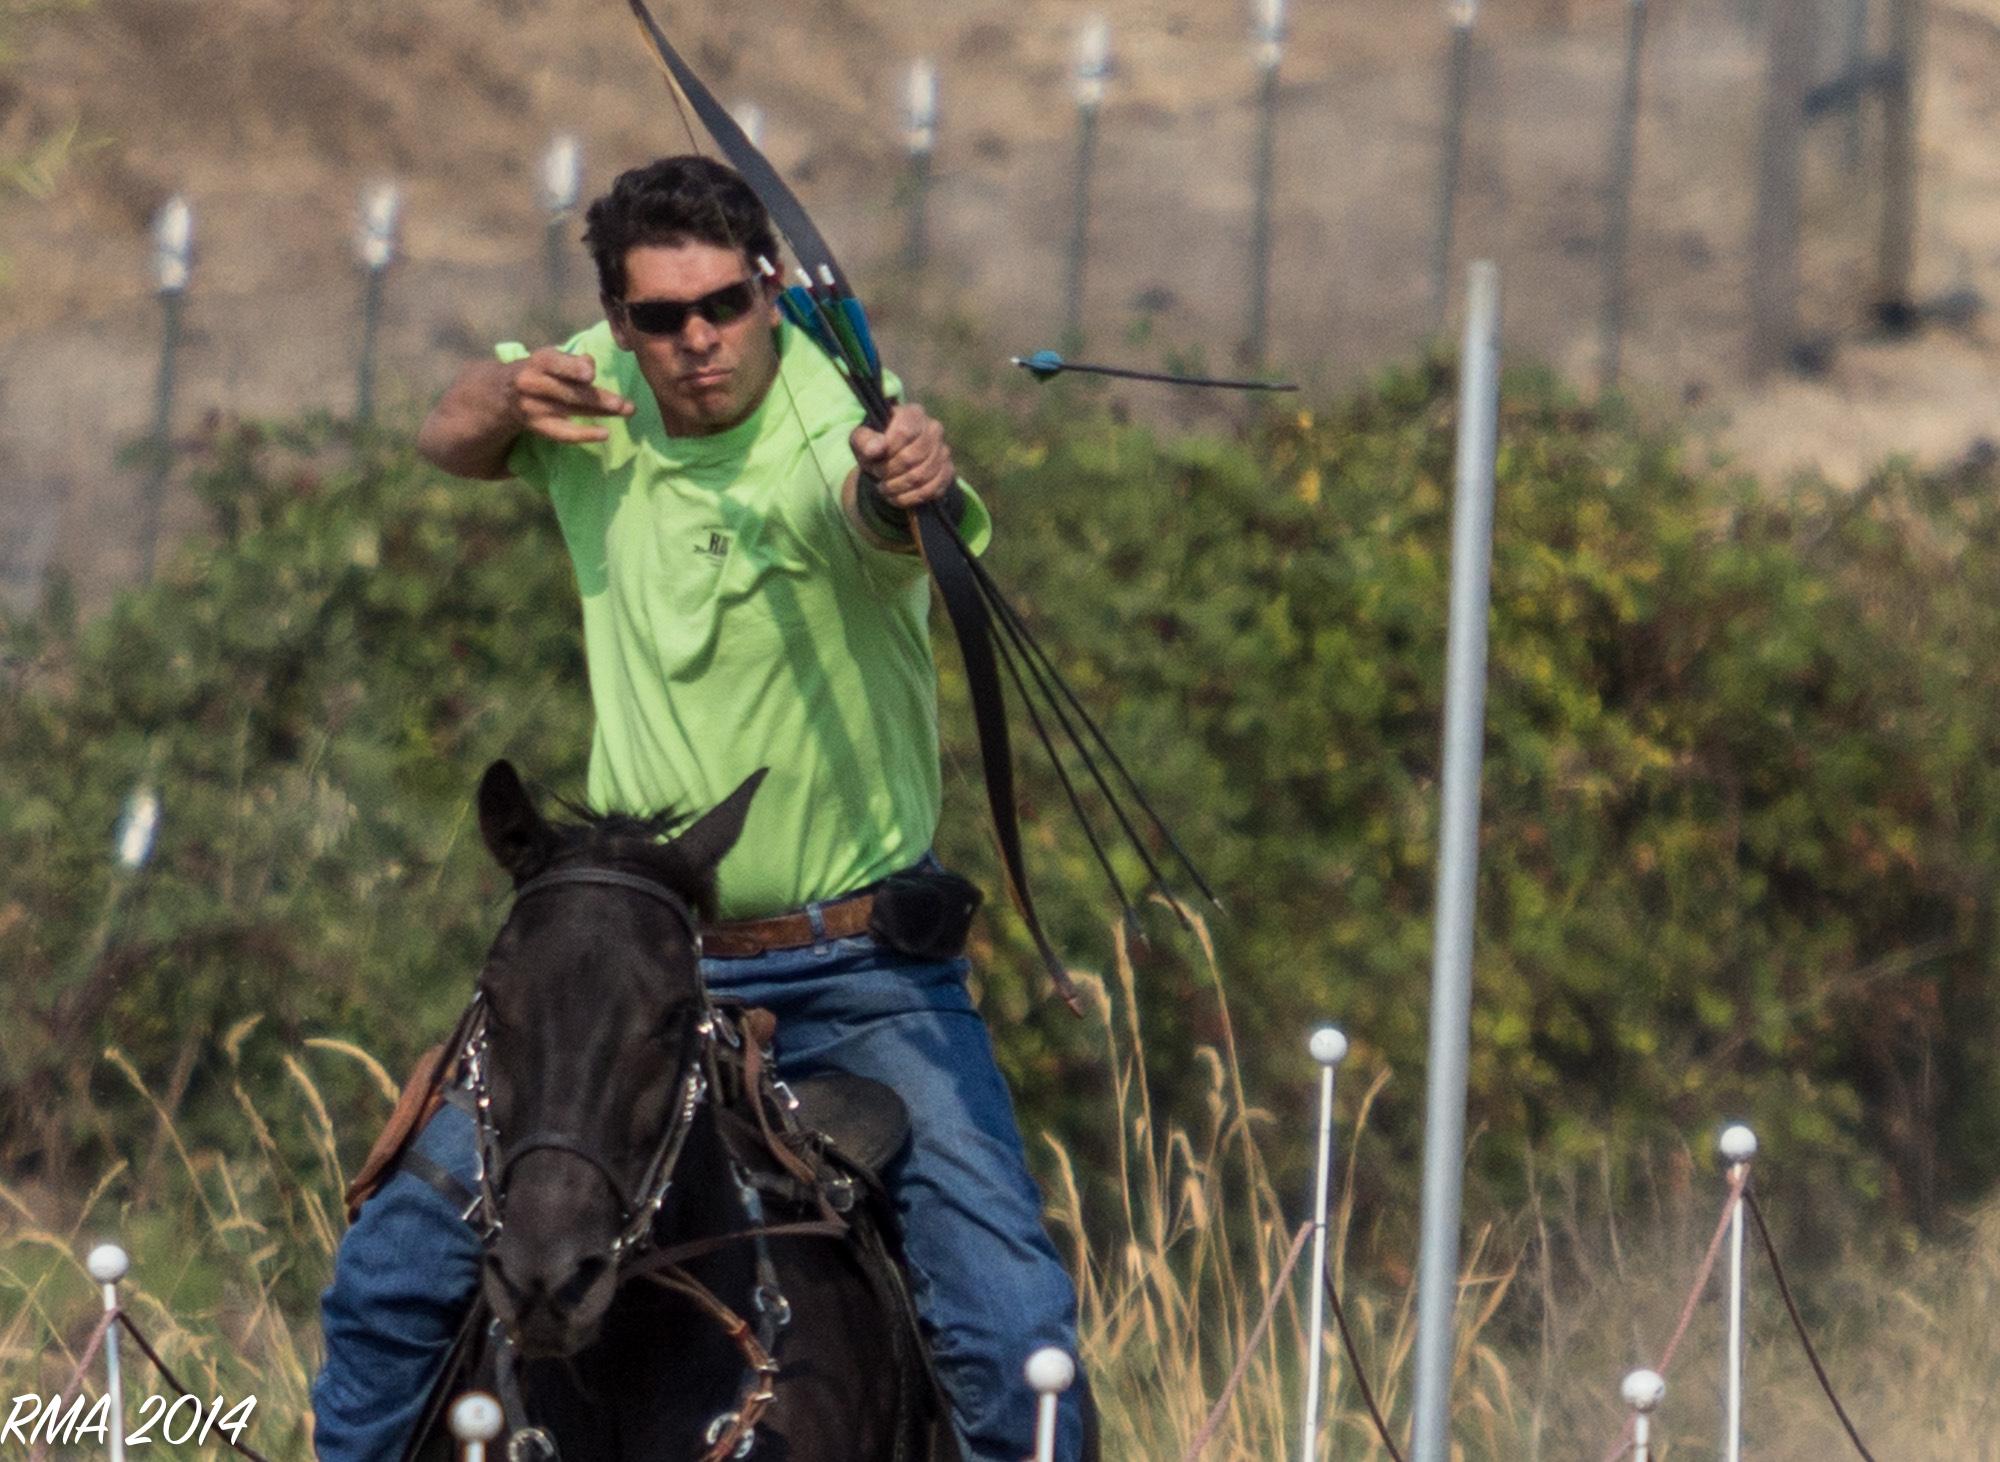 Horseback Archery Darran Wardle